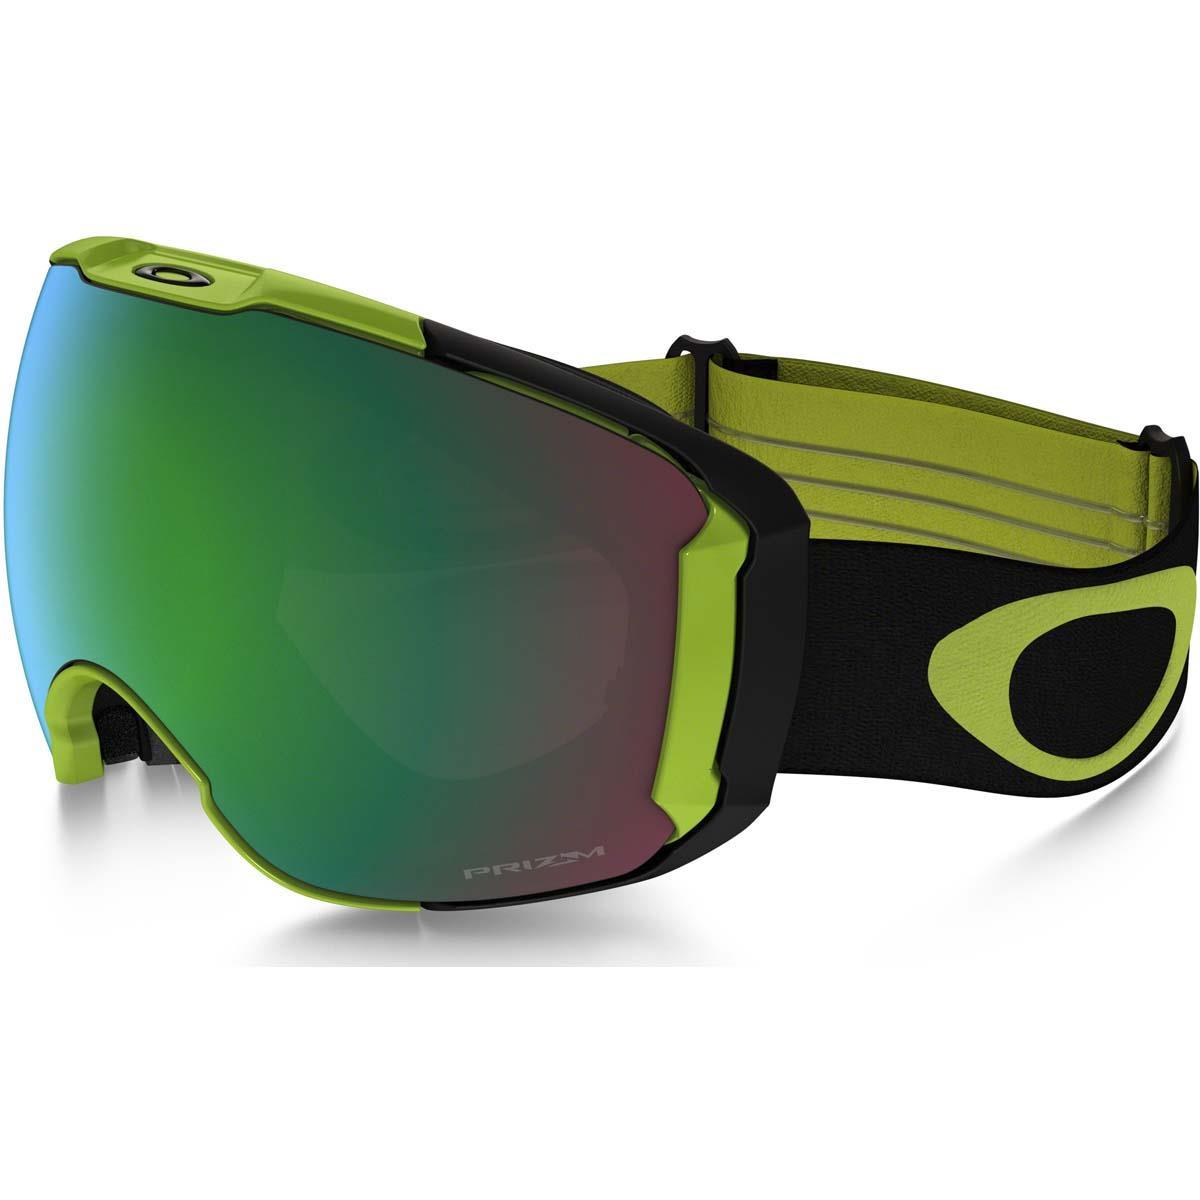 77879c6b688 Oakley Airbrake XL Prizm Goggle. Loading zoom